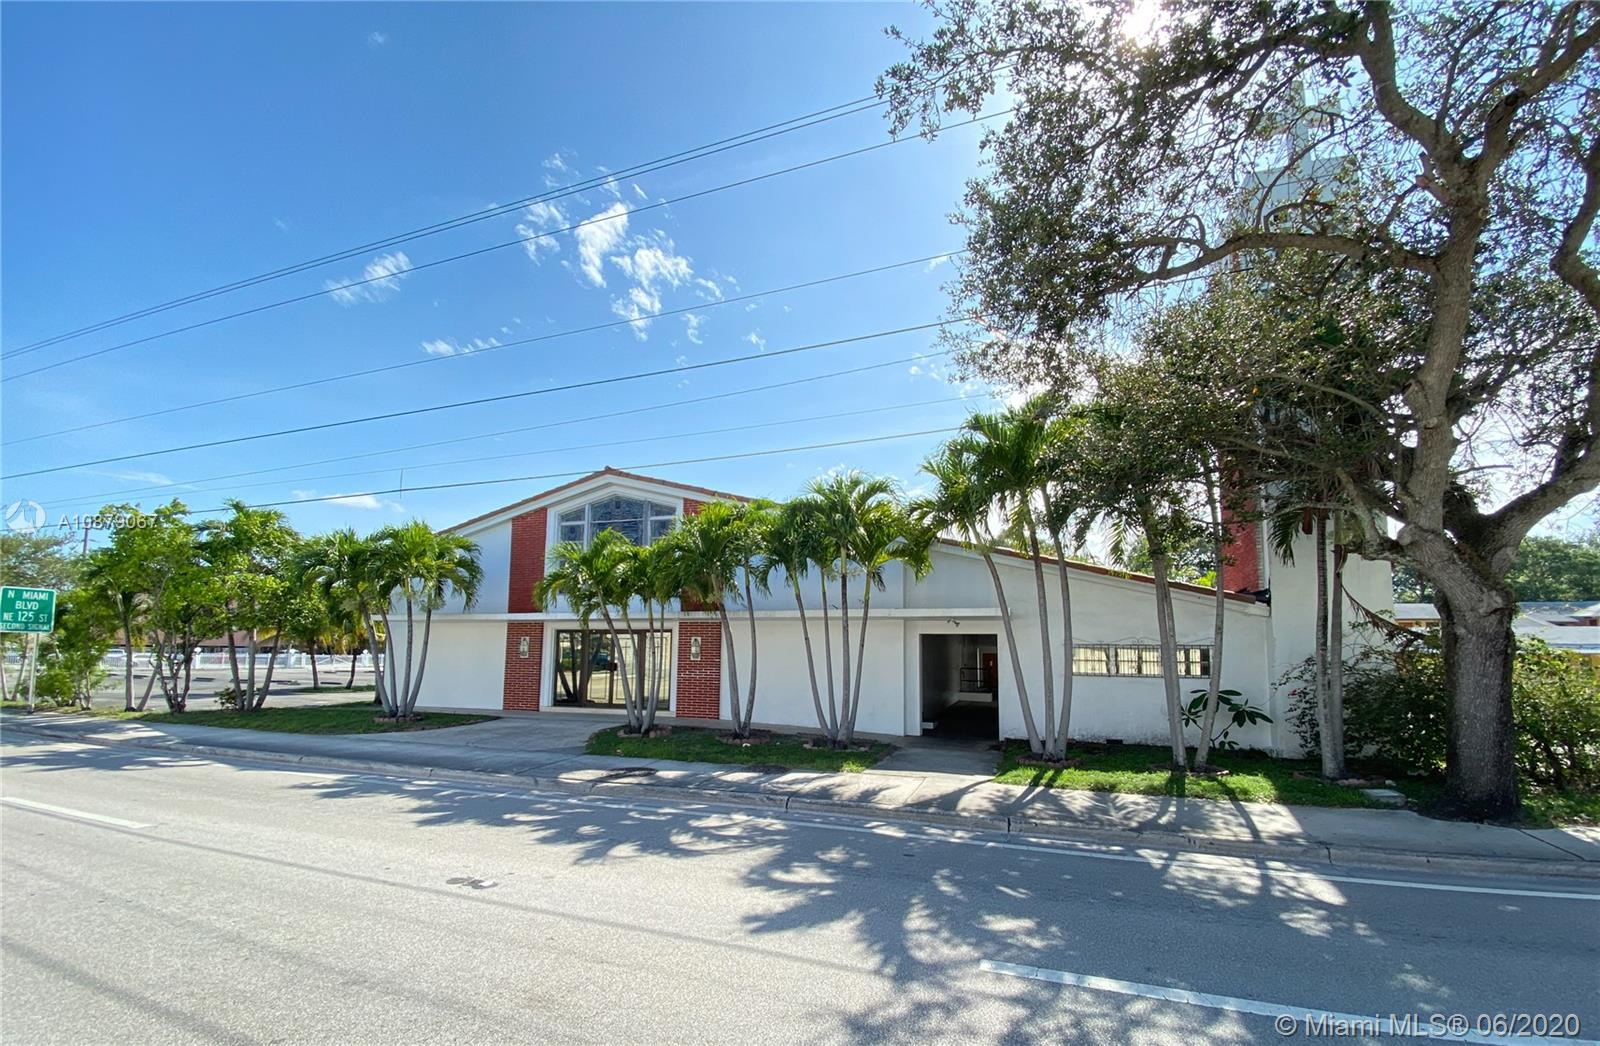 12830 NE 6th Ave Luxury Real Estate